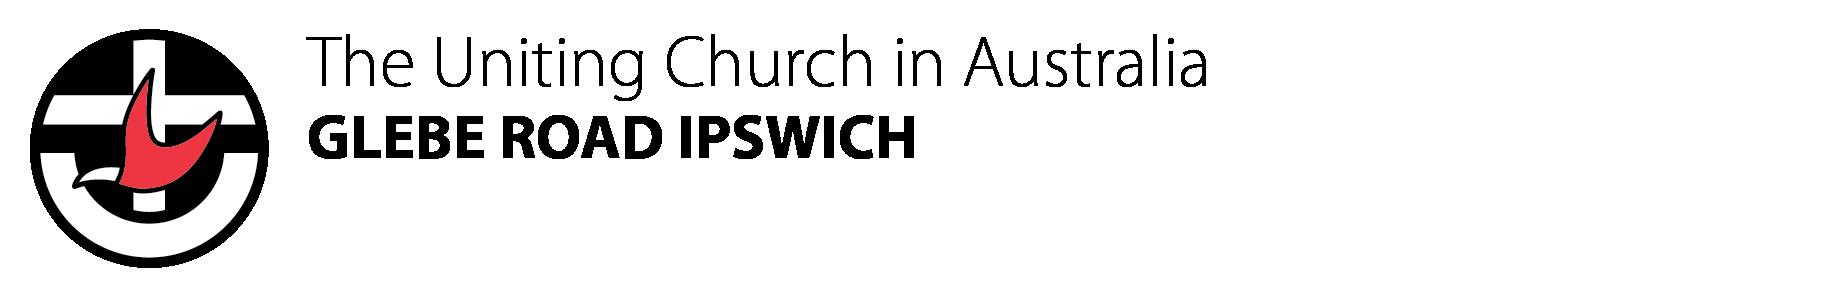 Glebe Road Ipswich Uniting Church